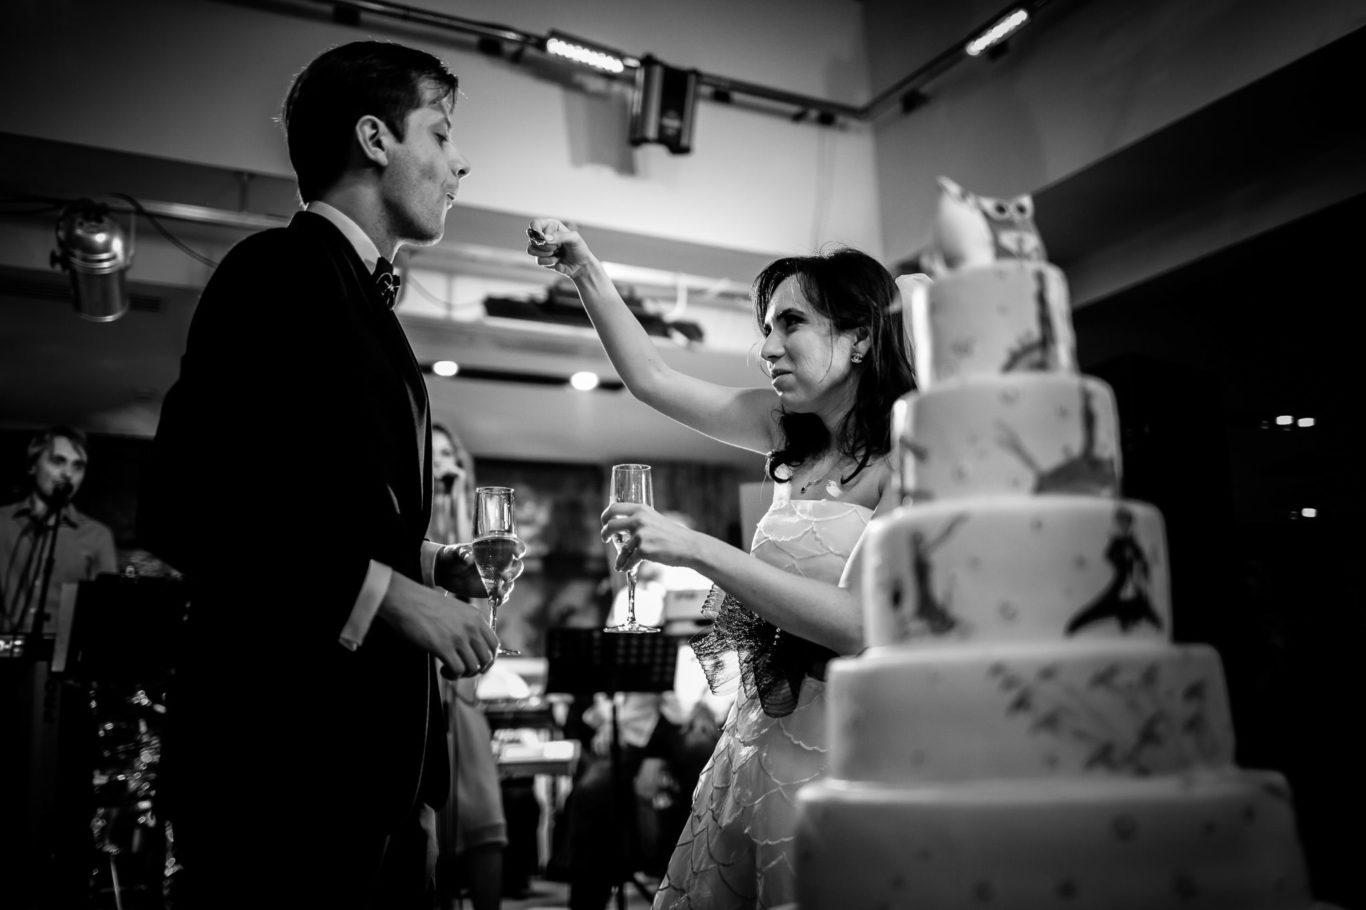 1030-Fotografie-nunta-Simona-Valentin-fotograf-Ciprian-Dumitrescu-CDF_0434